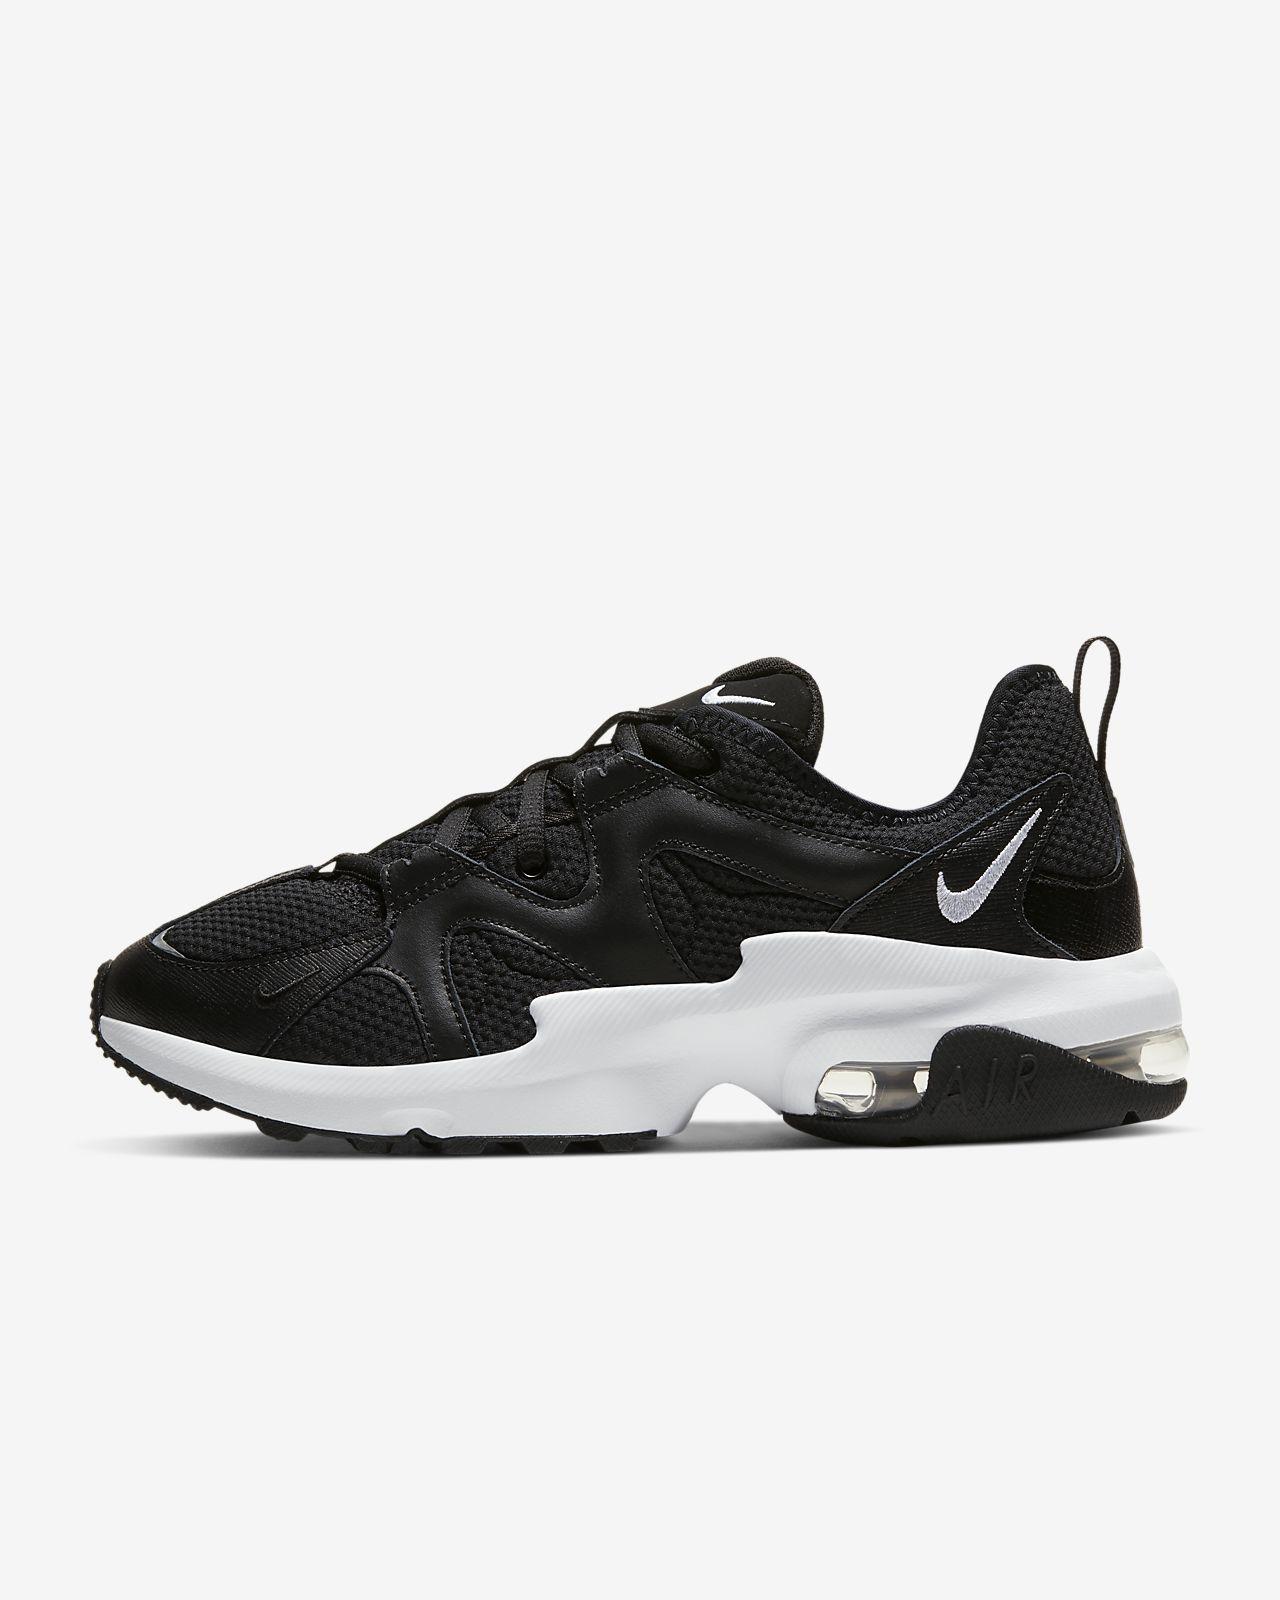 Nike Air Max Graviton (White Black)